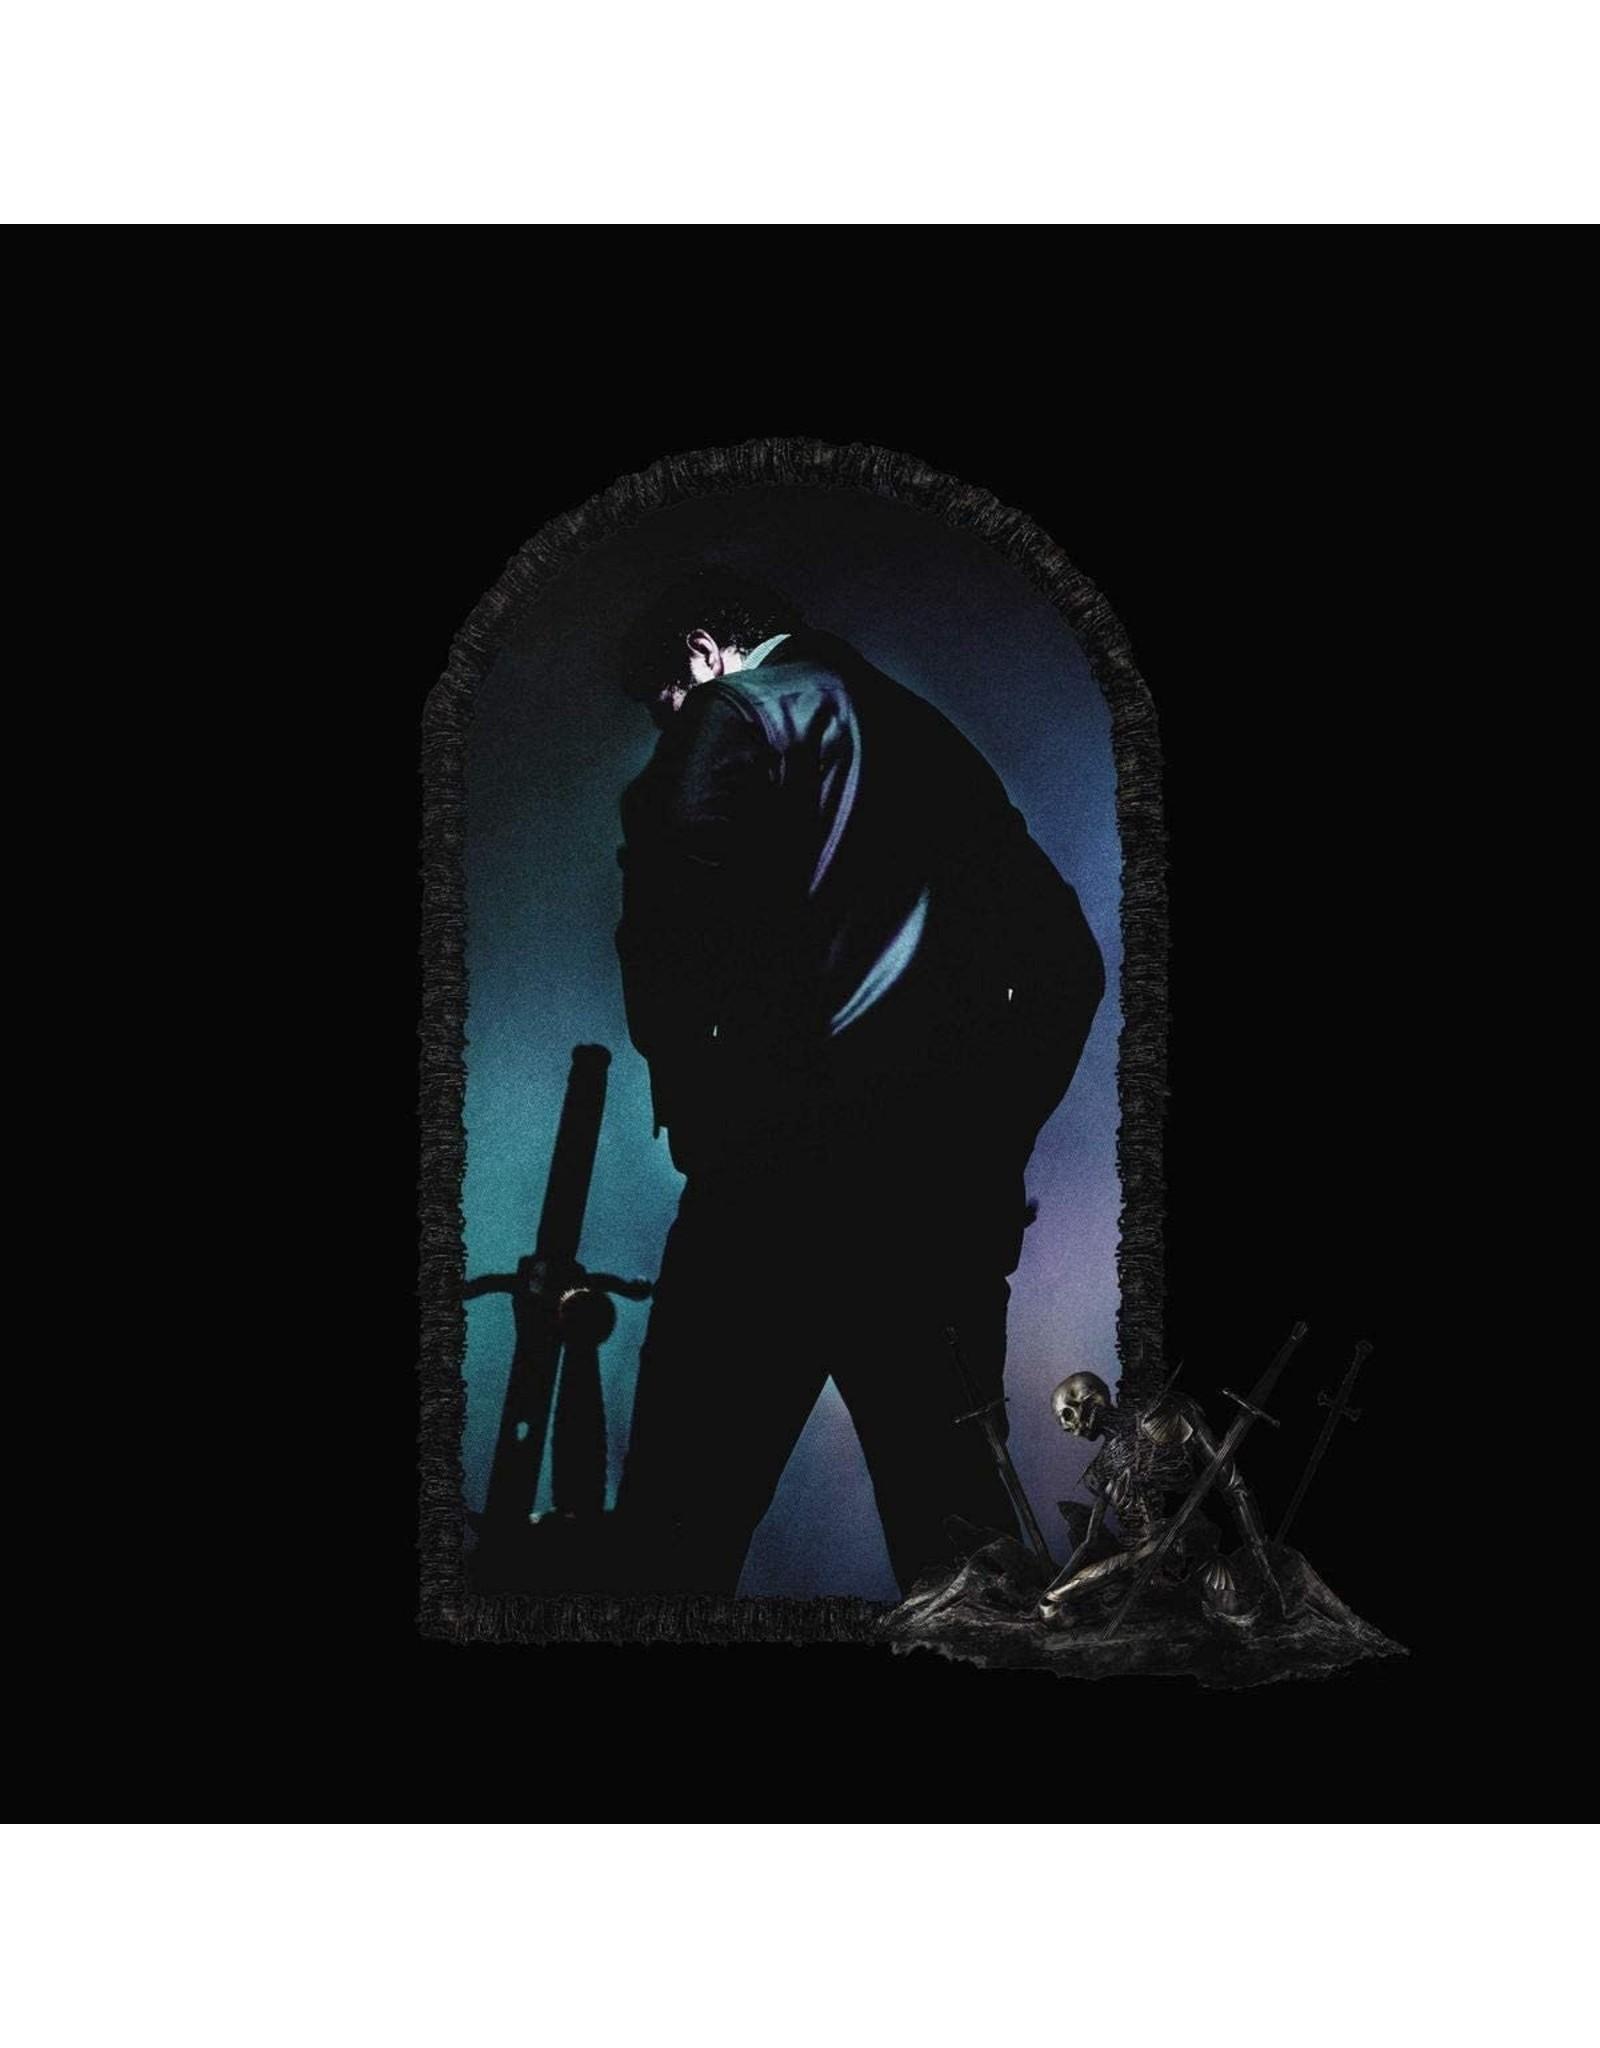 Post Malone - Hollywood's Bleeding (Exclusive Lavender Vinyl)